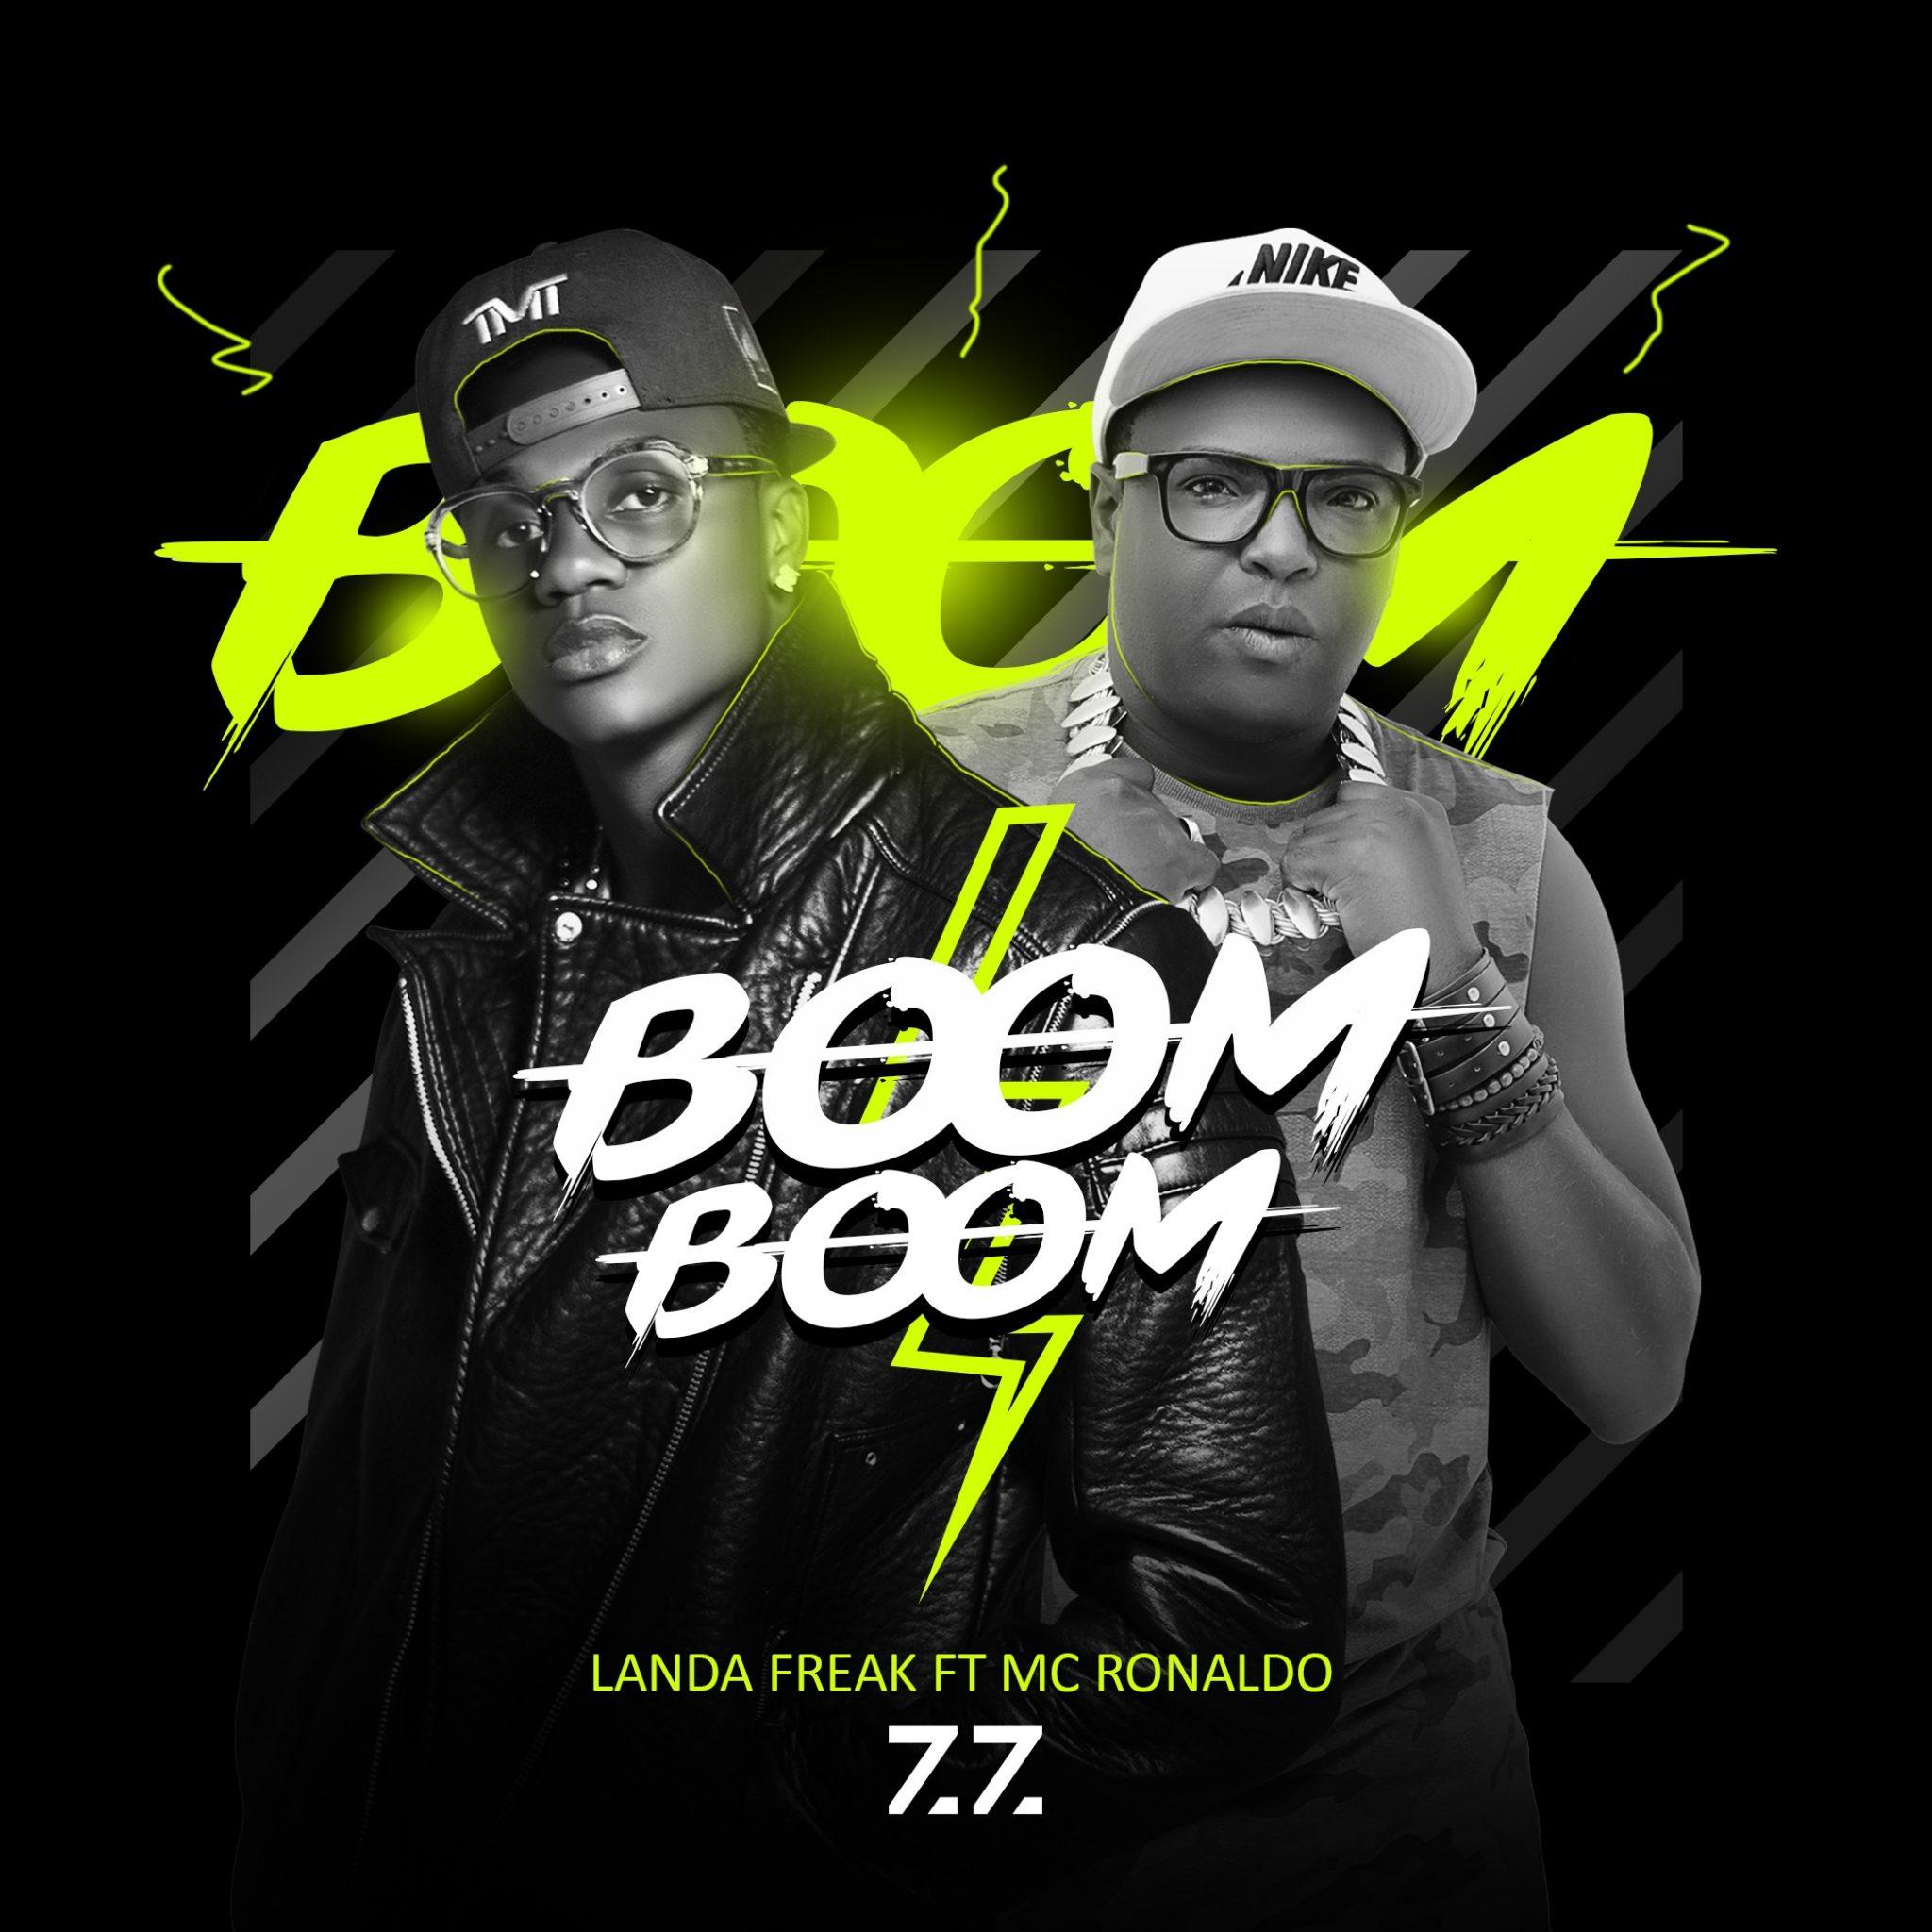 Landa freak ft mc ronaldo Boom Boom - Landa Freak Ft. Mc Ronaldo - Boom Boom